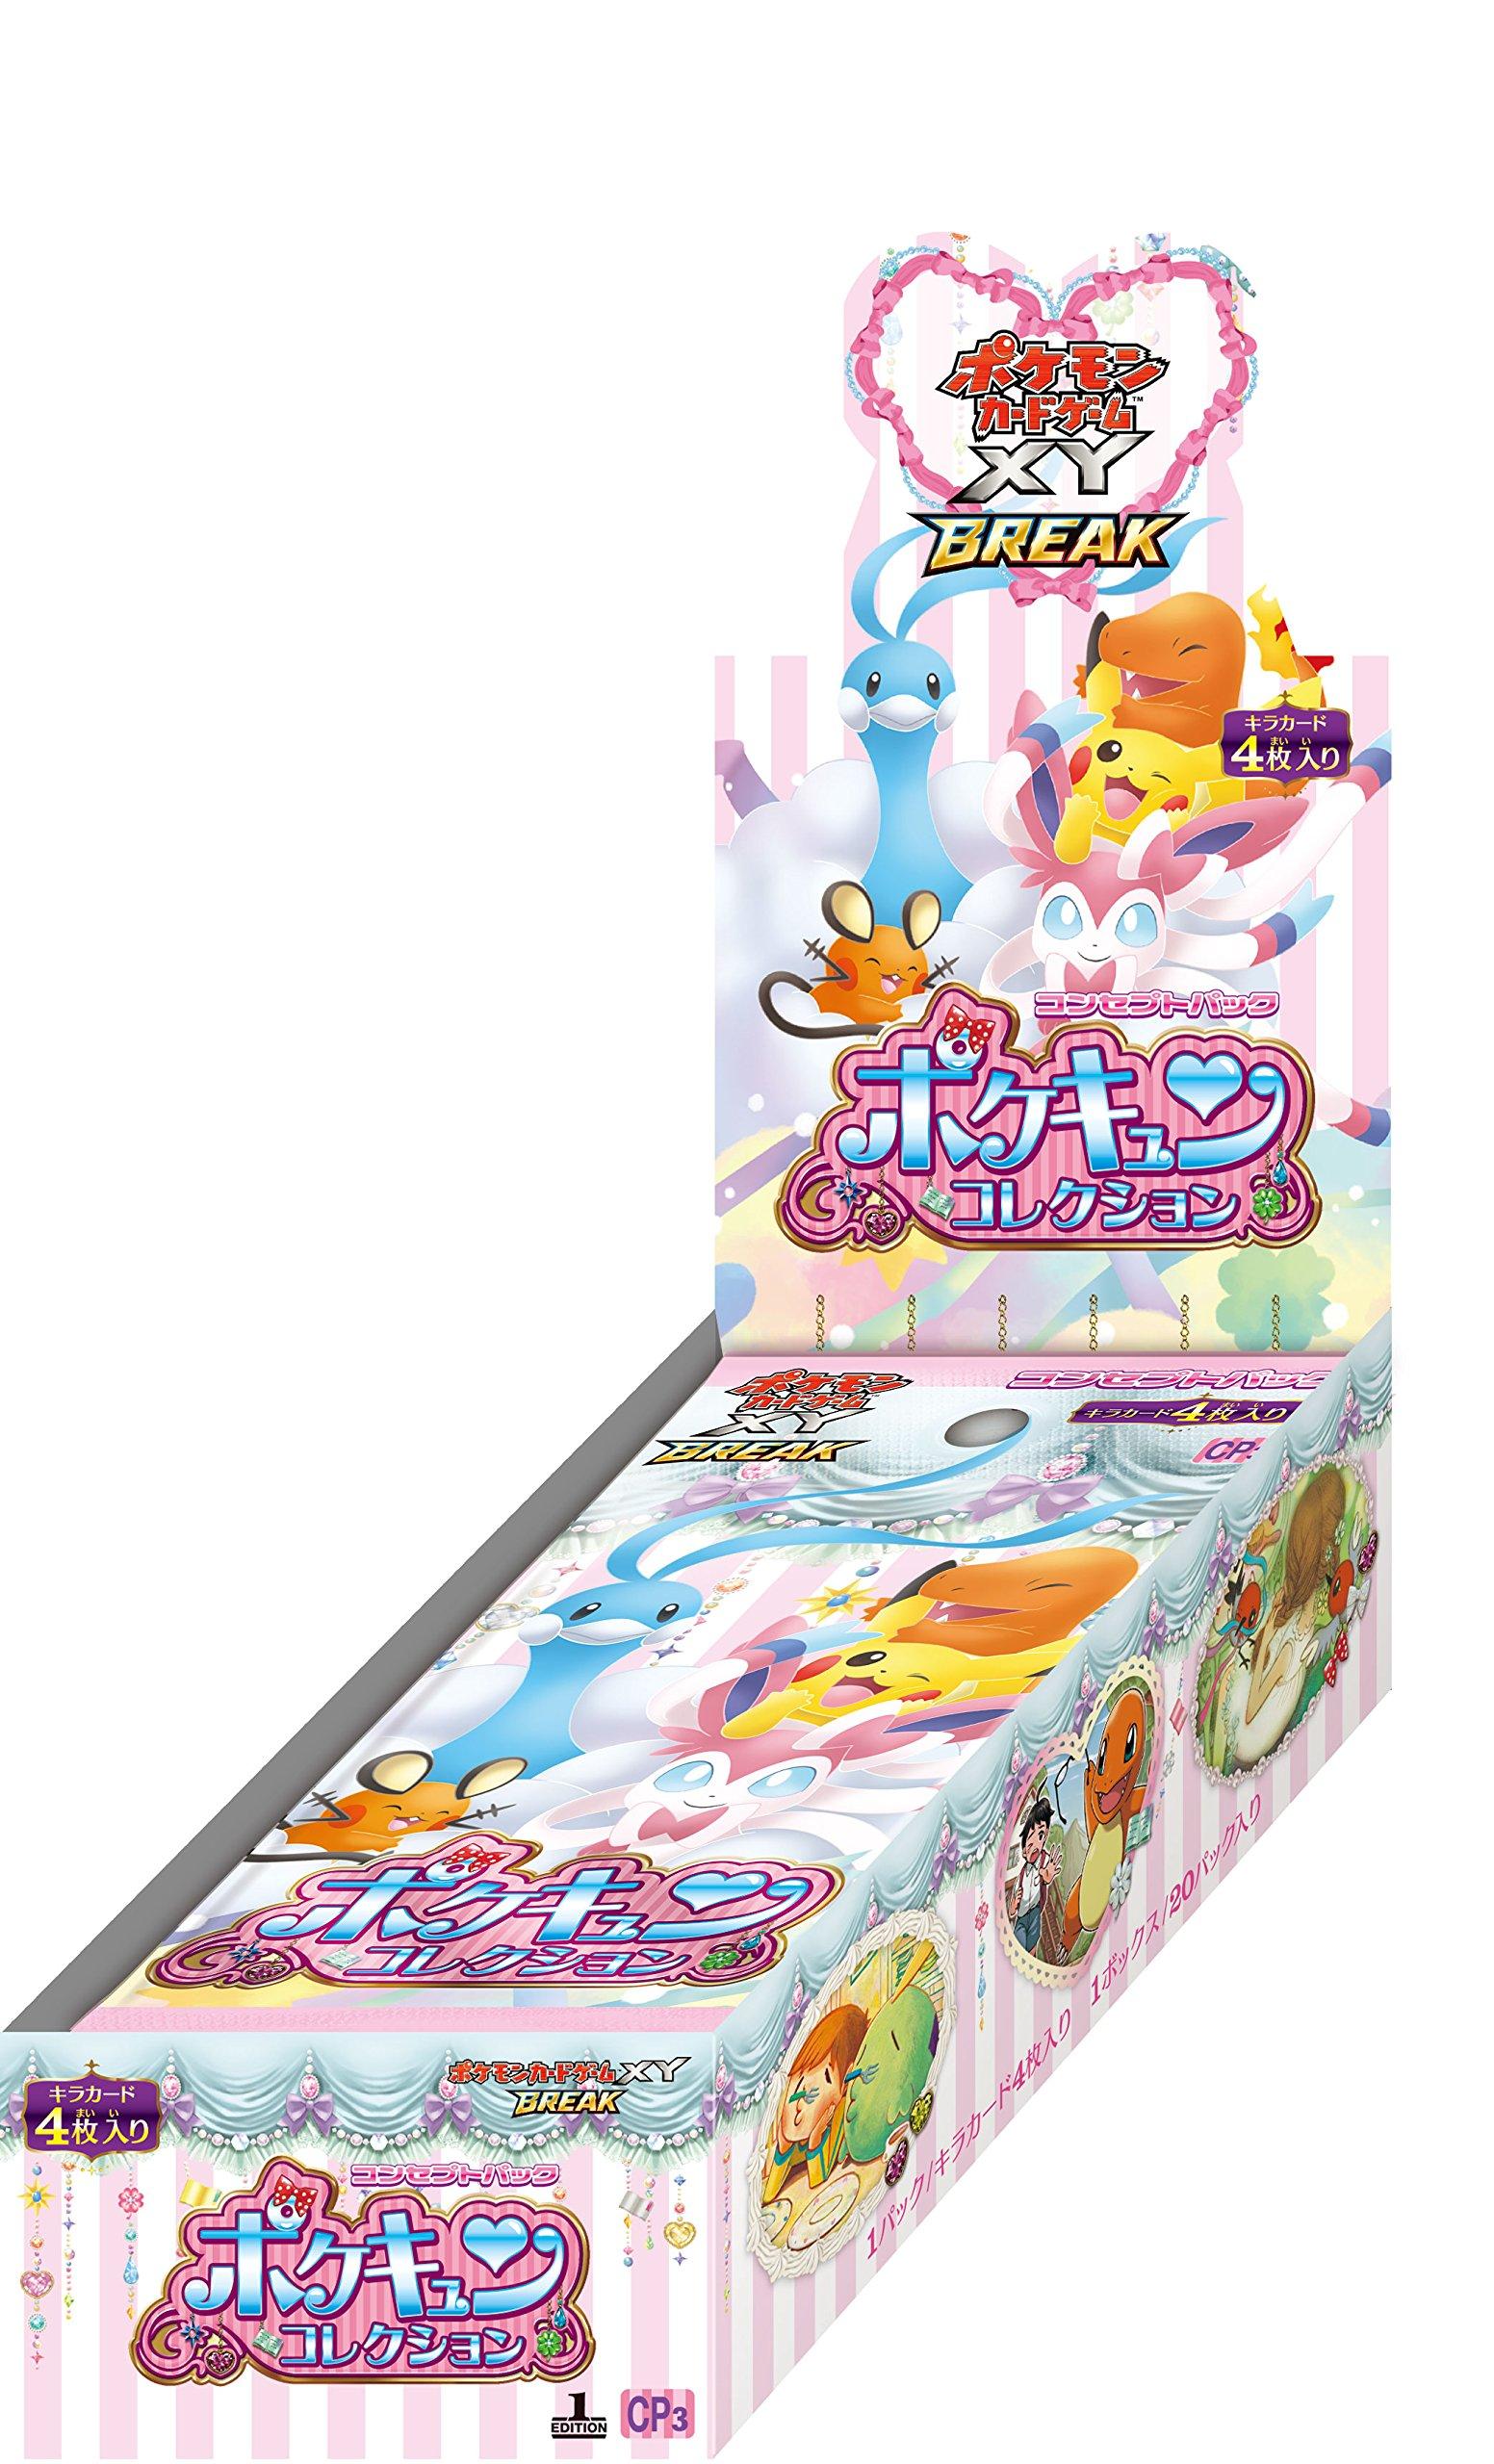 Pokemon Card XY Break Pokekyun / Cute Collection Kira Card Concept packs 1 BOX (Japanese Version)